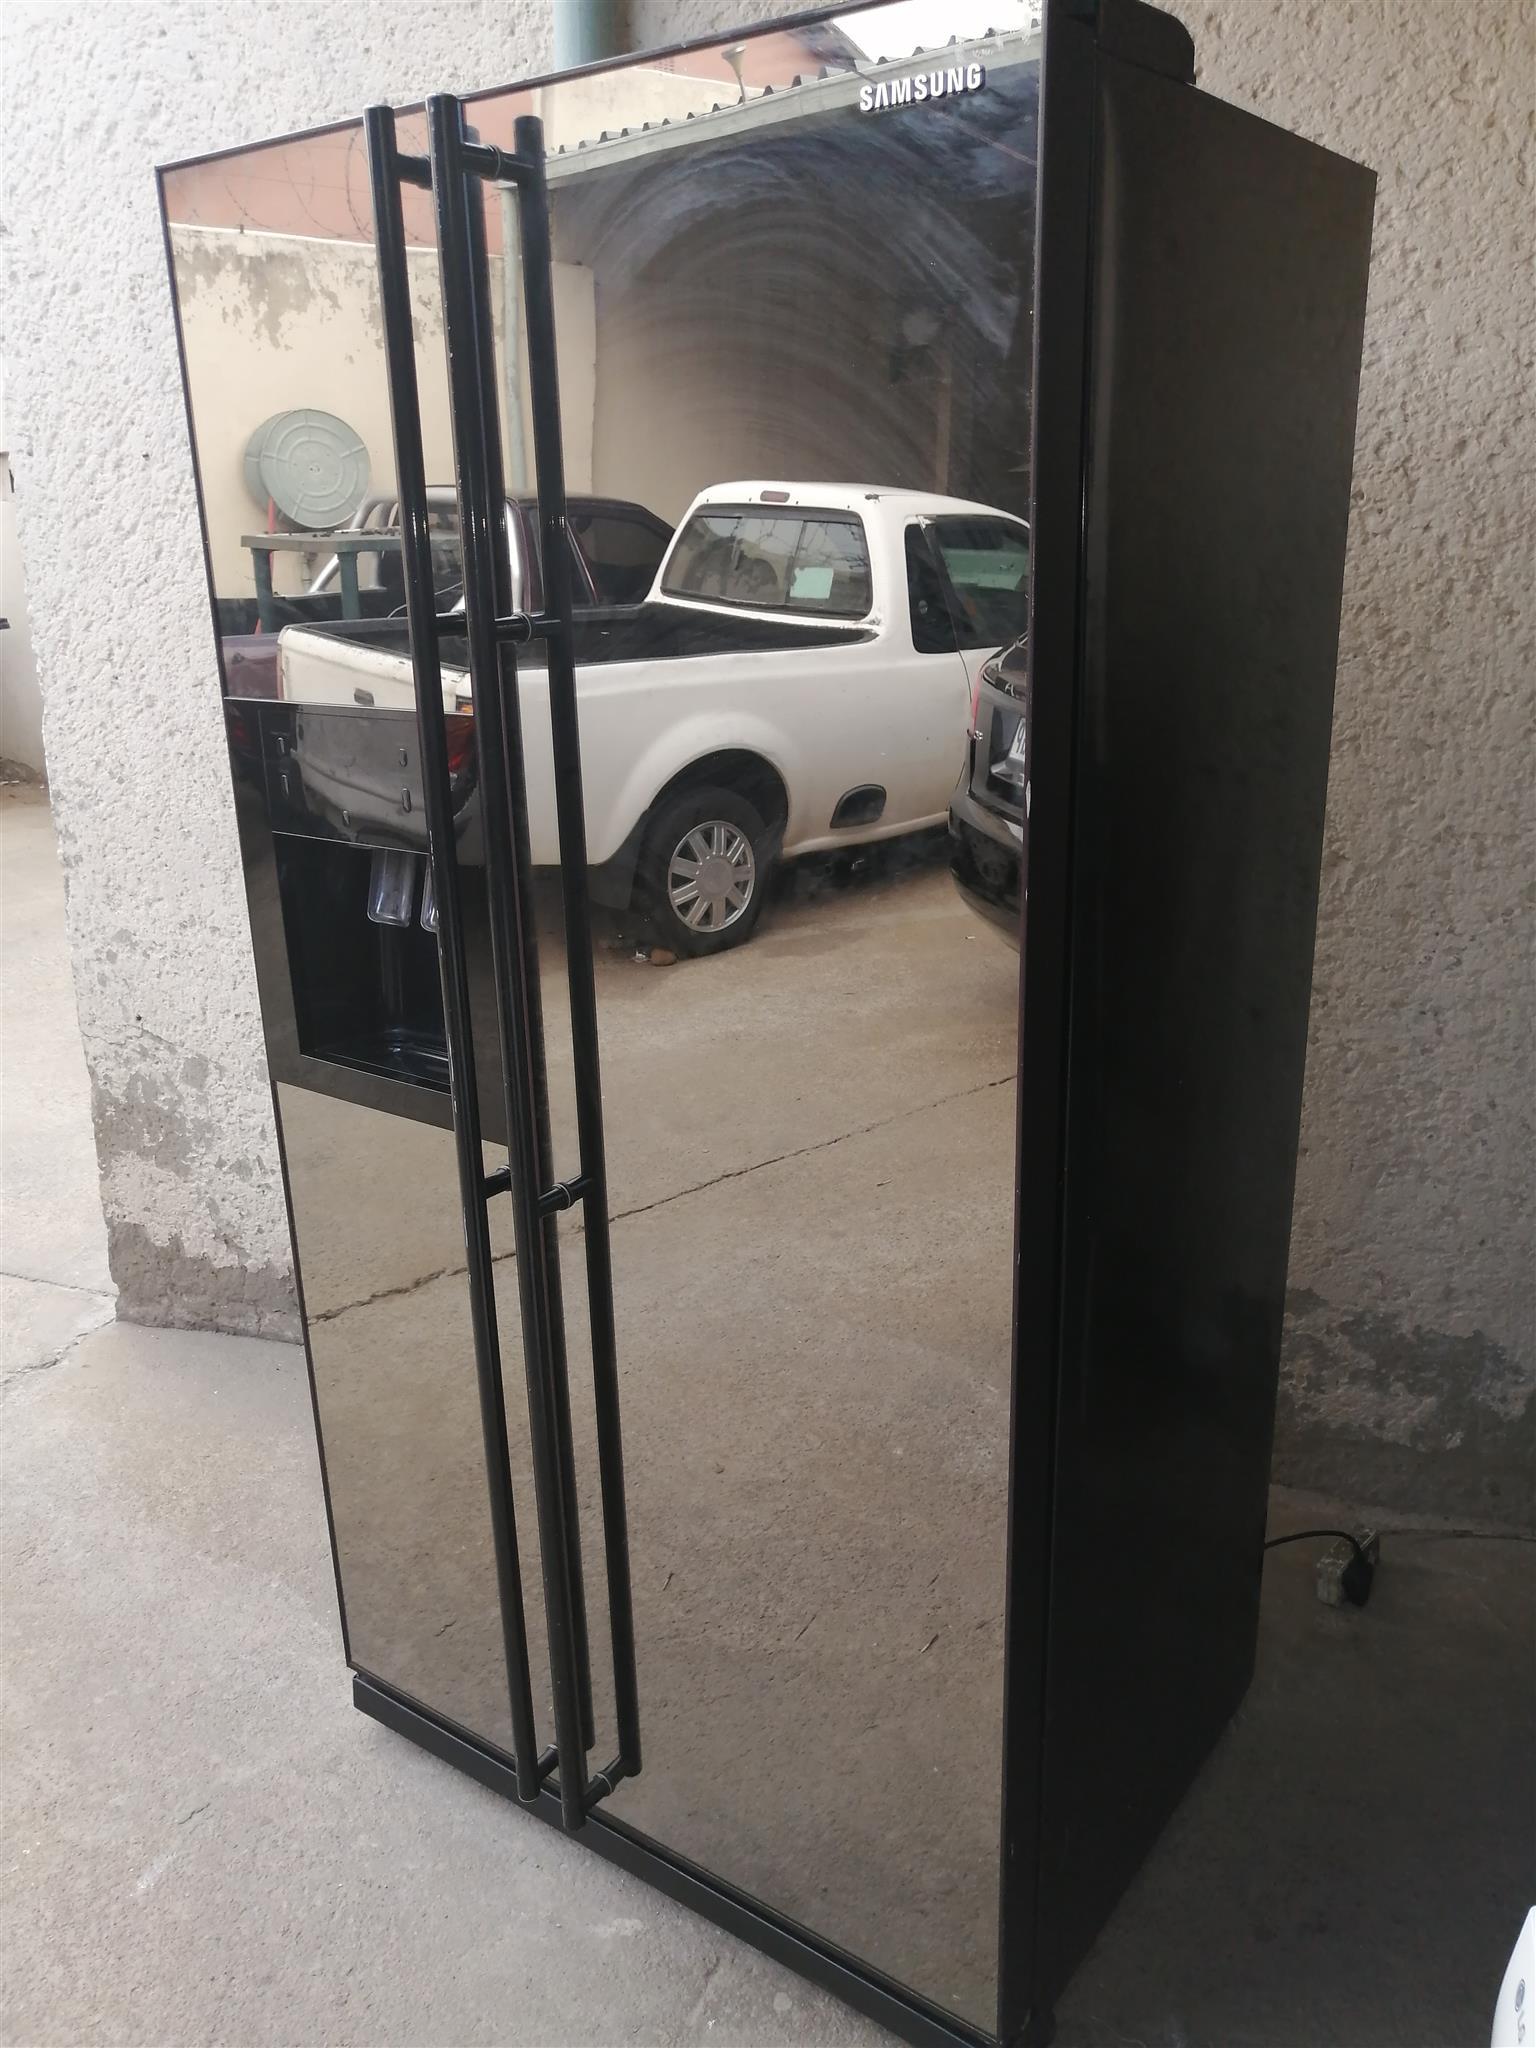 Fairly used double mirror door Samsung fridge